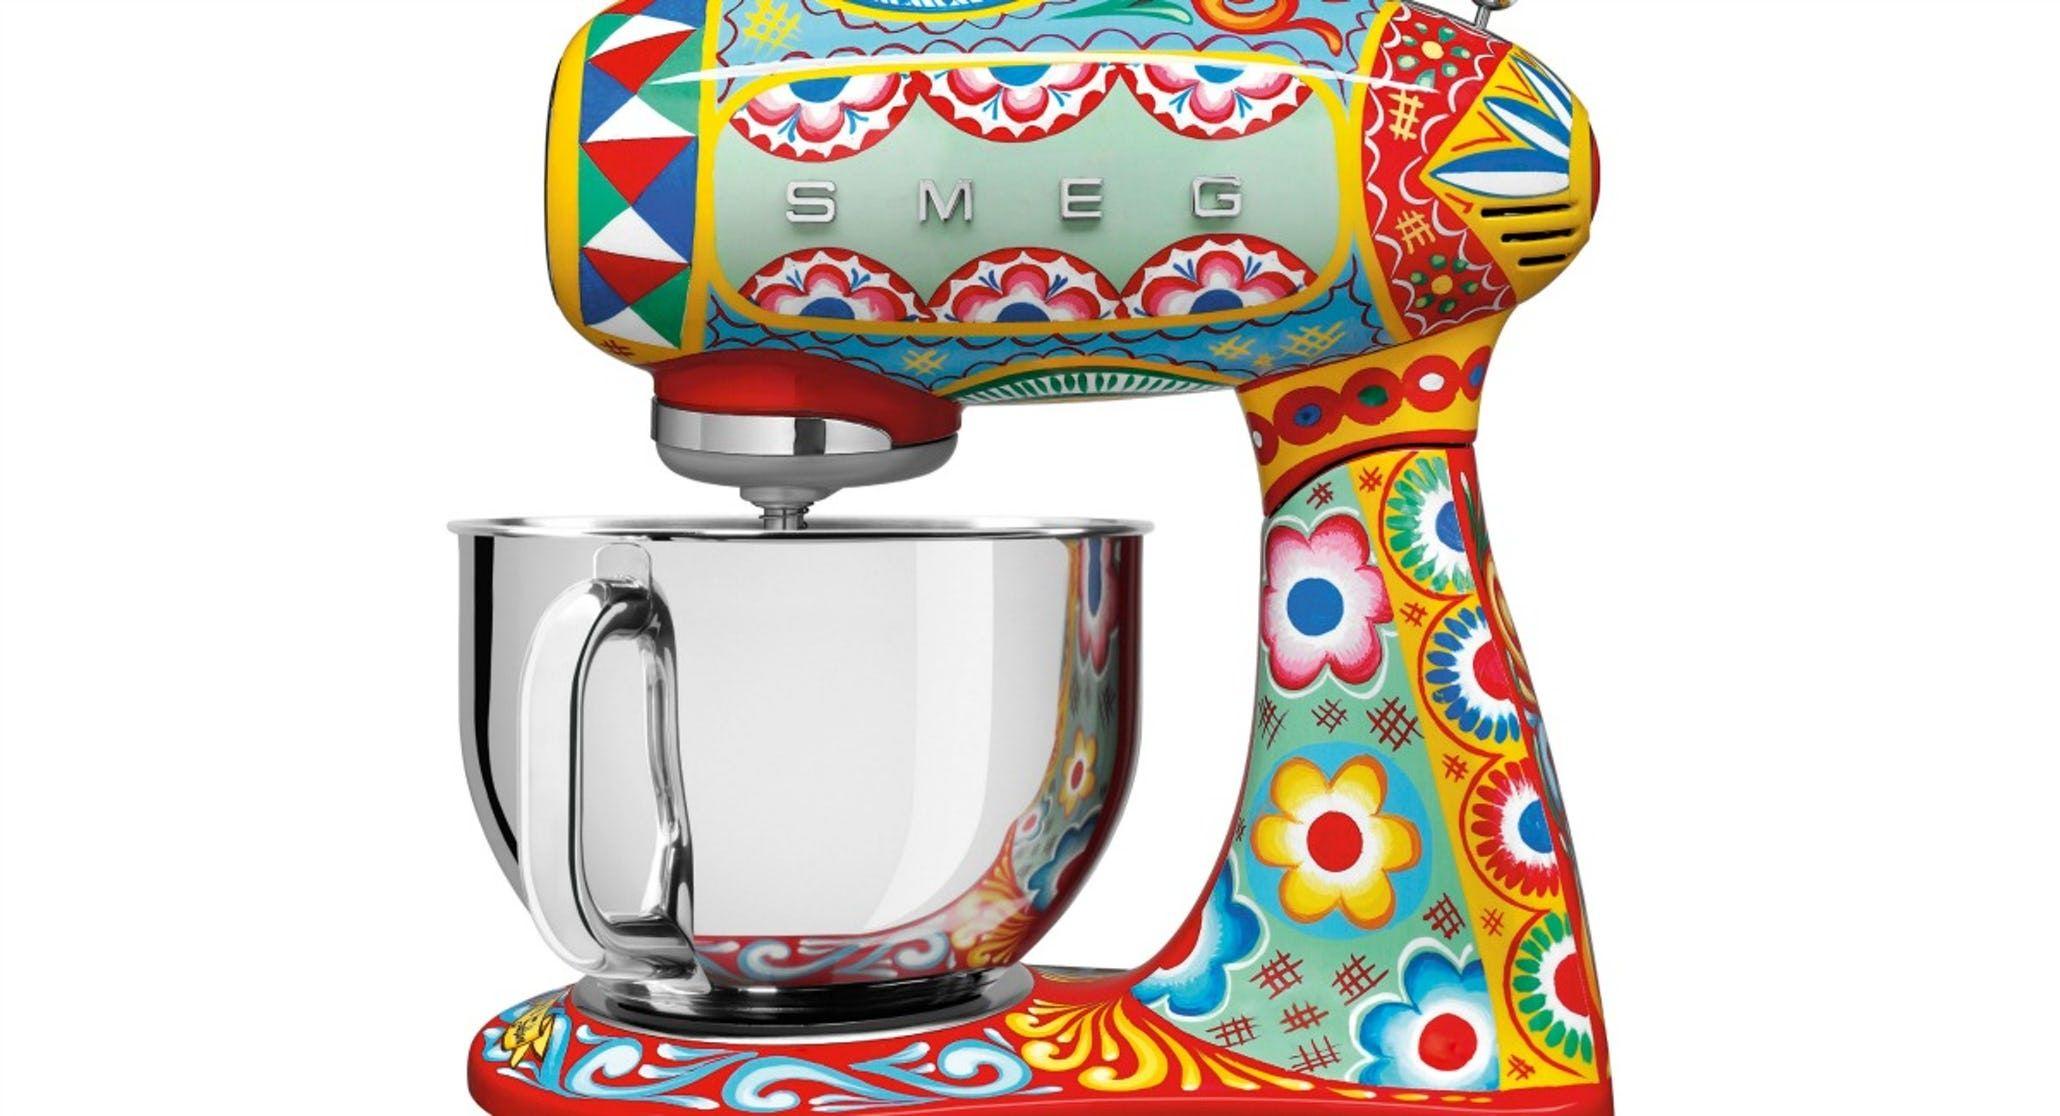 We Re Giving Away Dolce Gabbana S New Kitchen Appliances Smeg